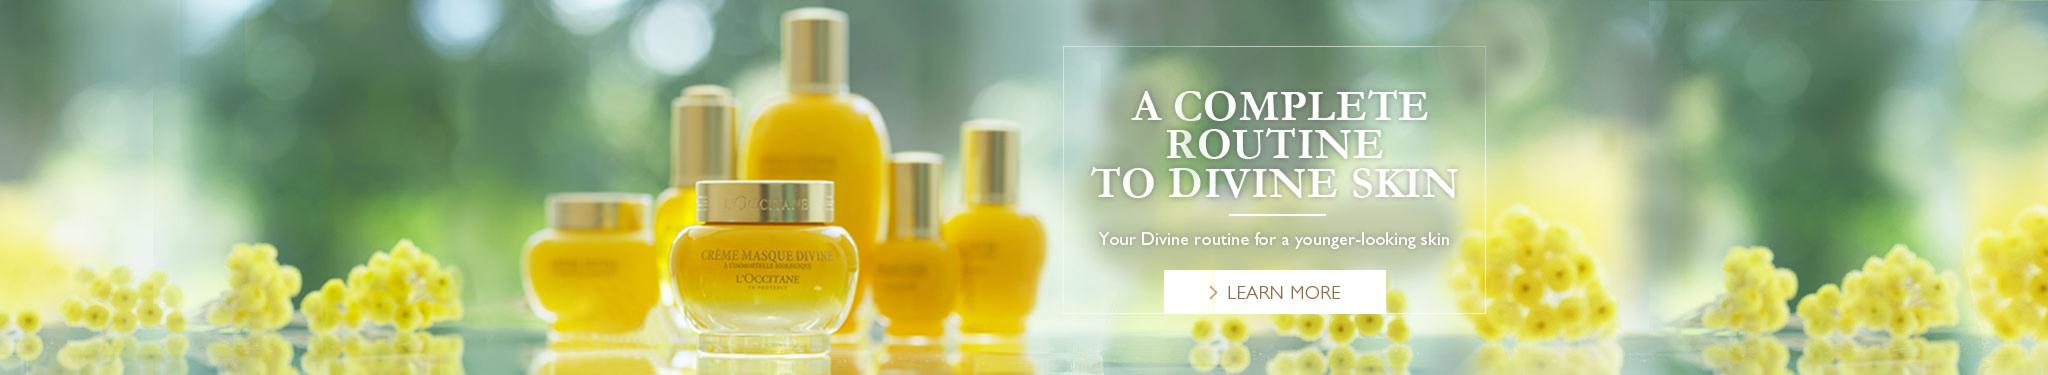 A Complete Routine To Divine Skin